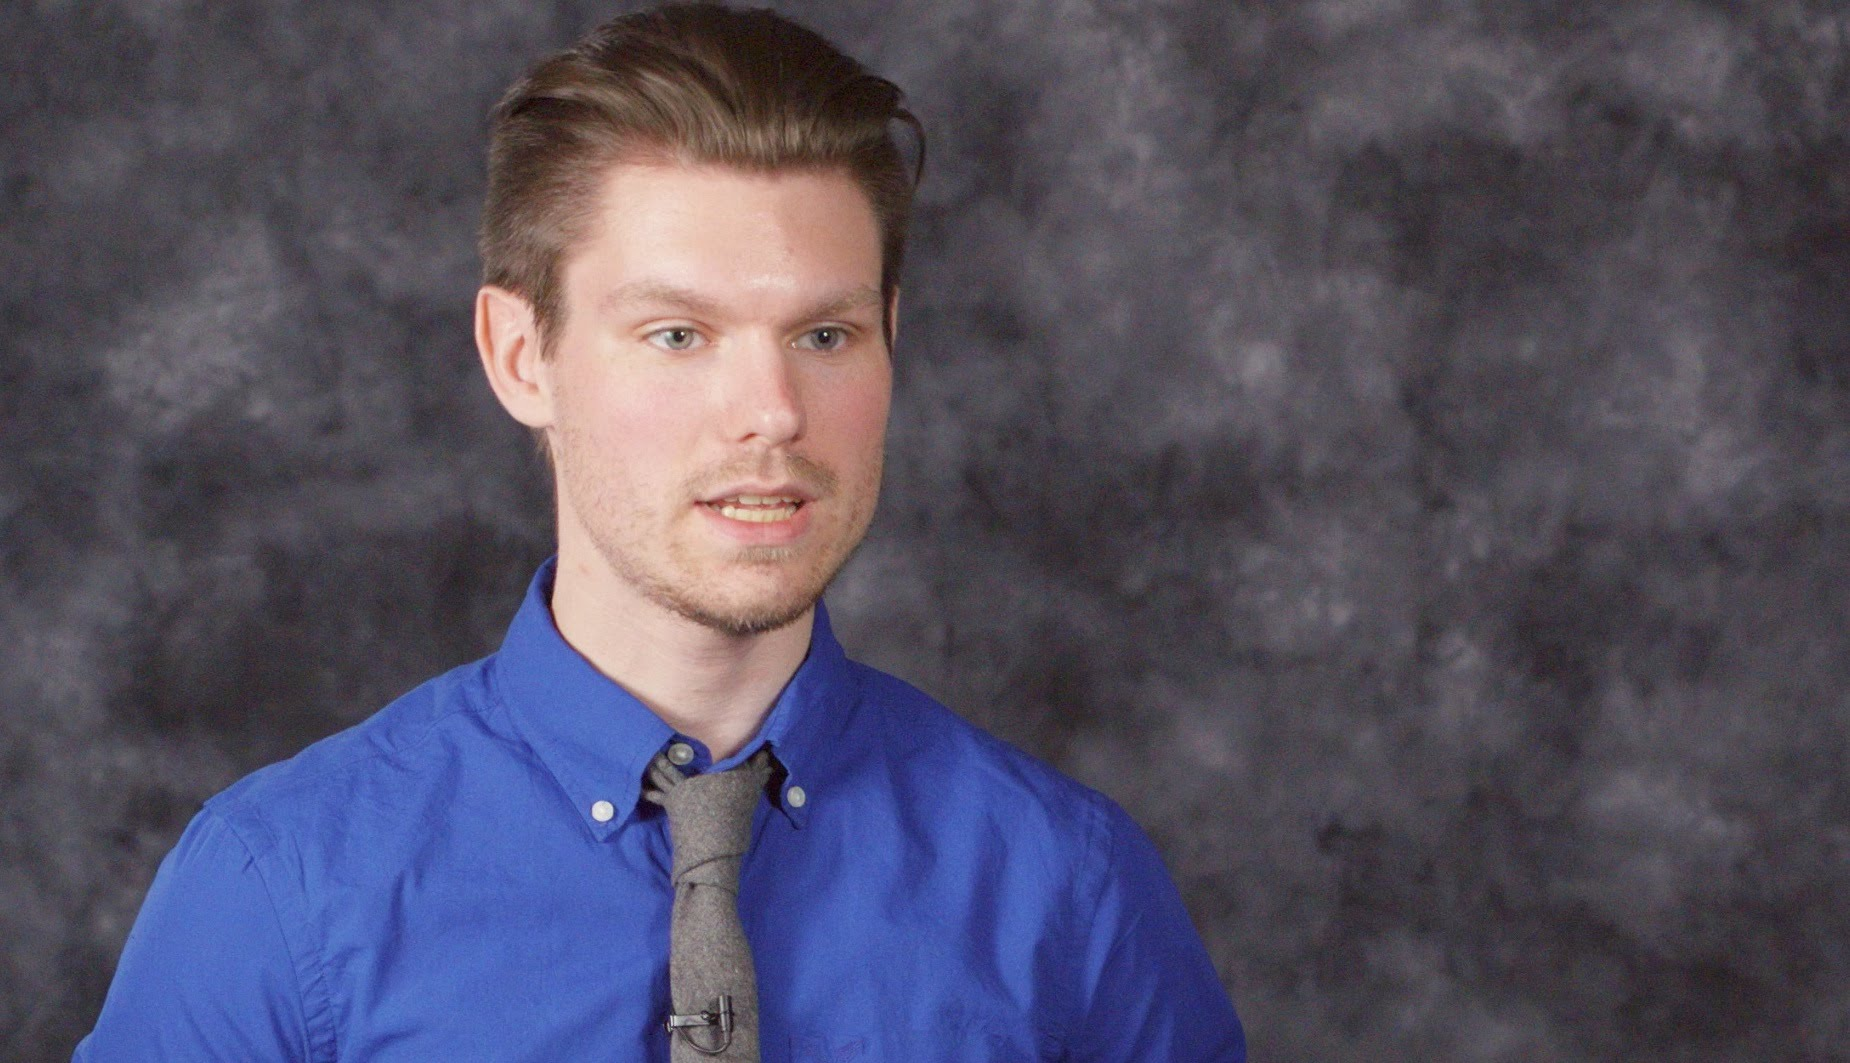 Thumbnail for: Student Testimonials